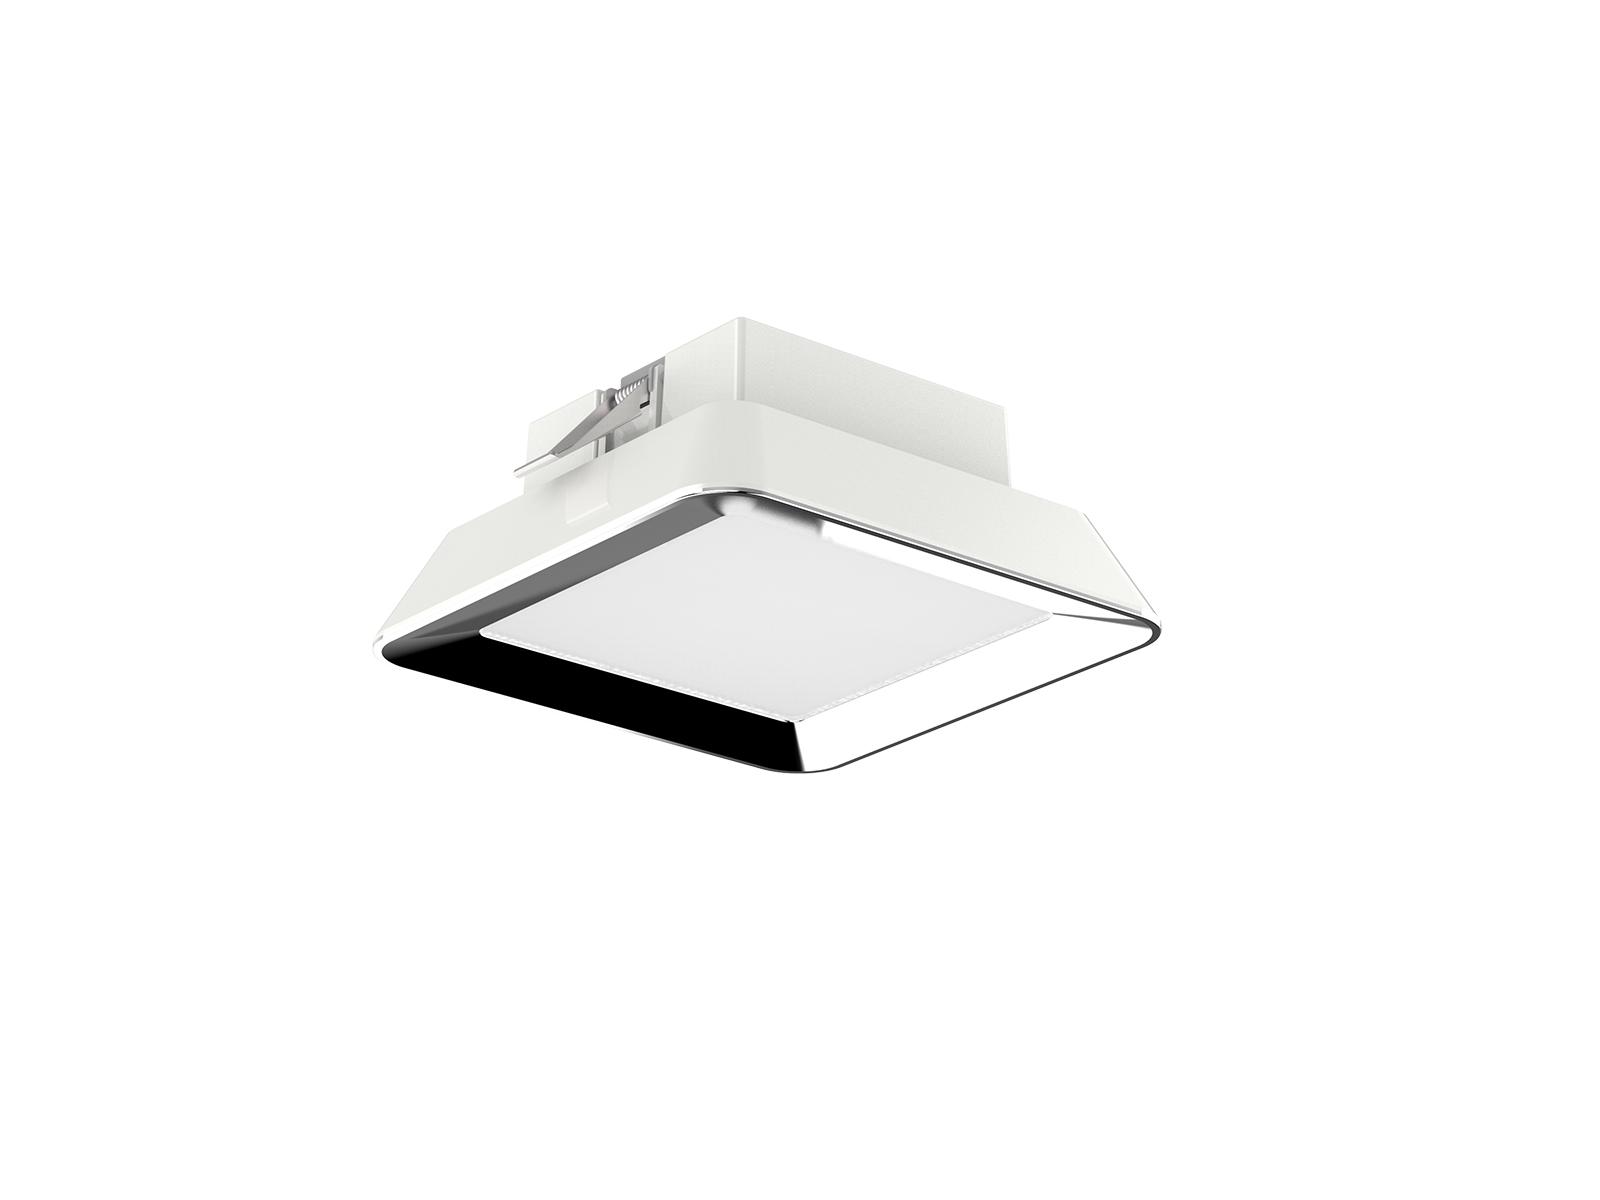 4 inch square recessed lighting